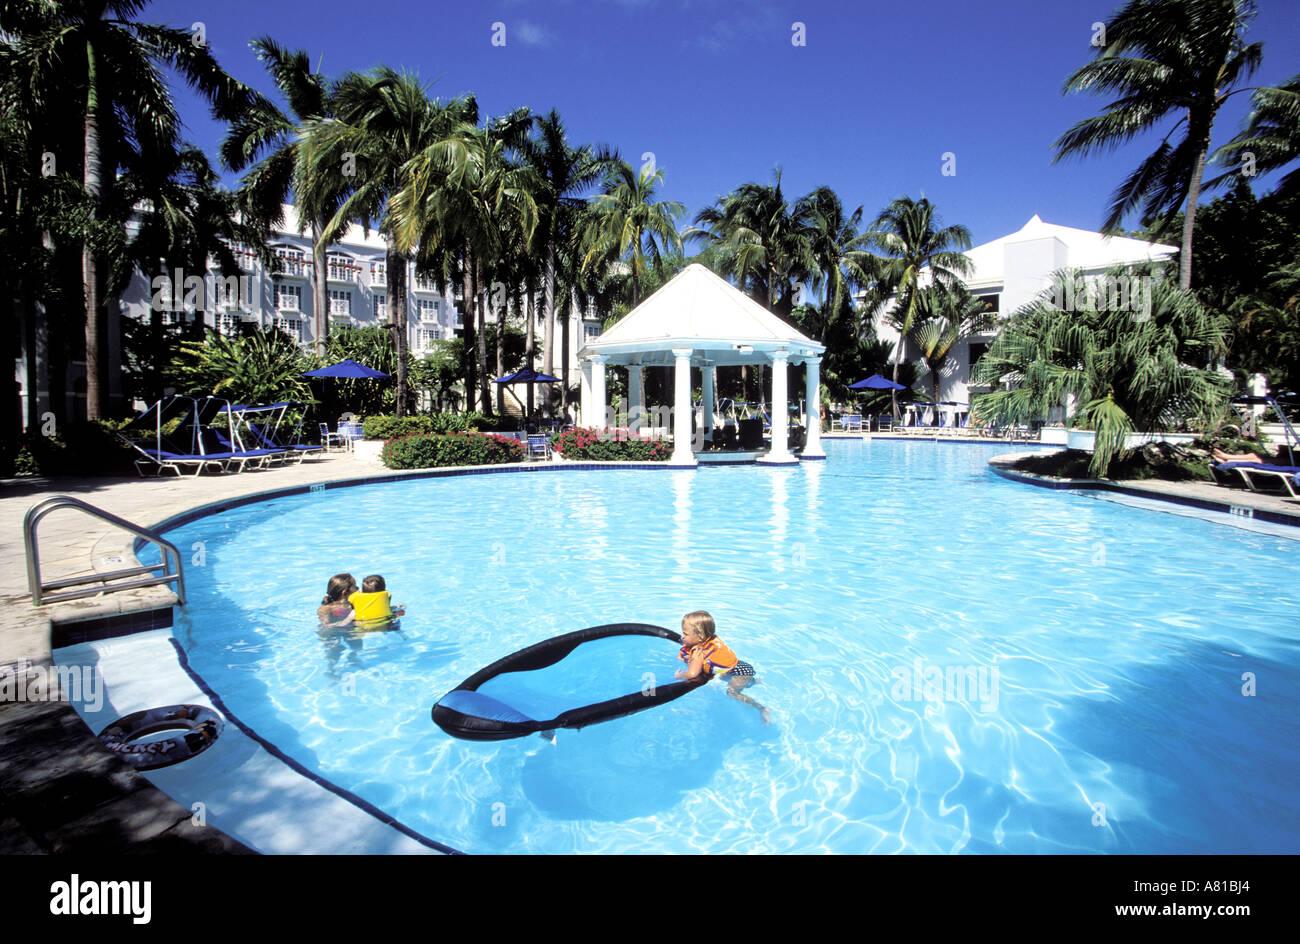 Cayman Islands Grand Cayman The Hotel Hyatt Swimming Pool Stock Photo Royalty Free Image